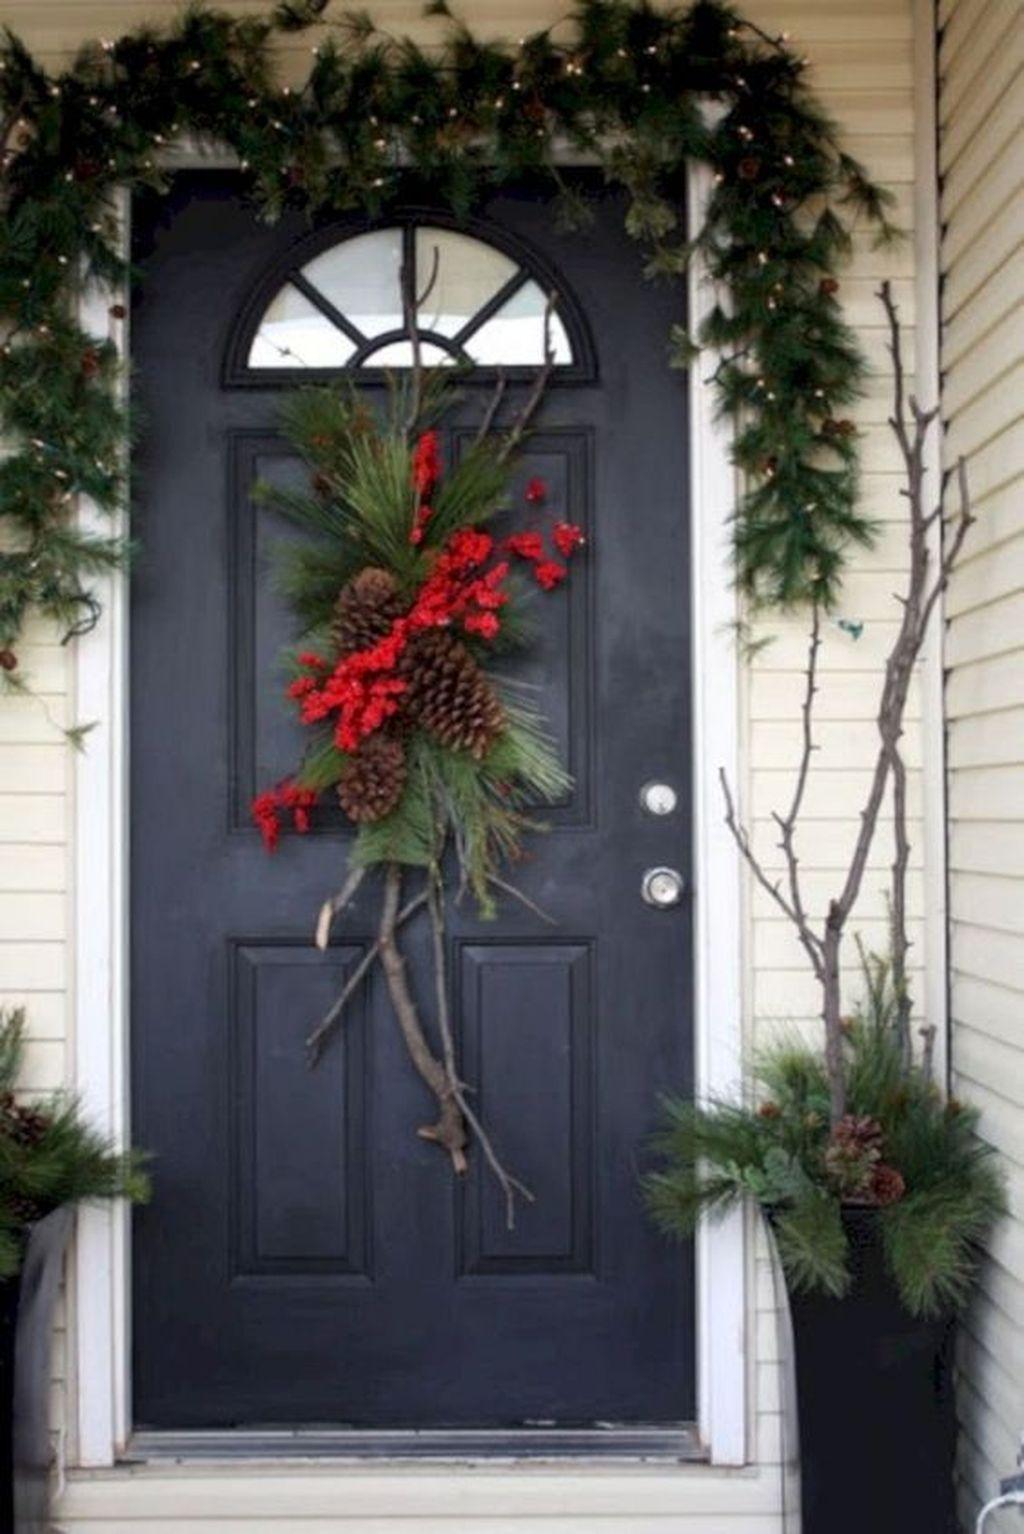 Creative Christmas Door Decoration Ideas To Inspire You 29